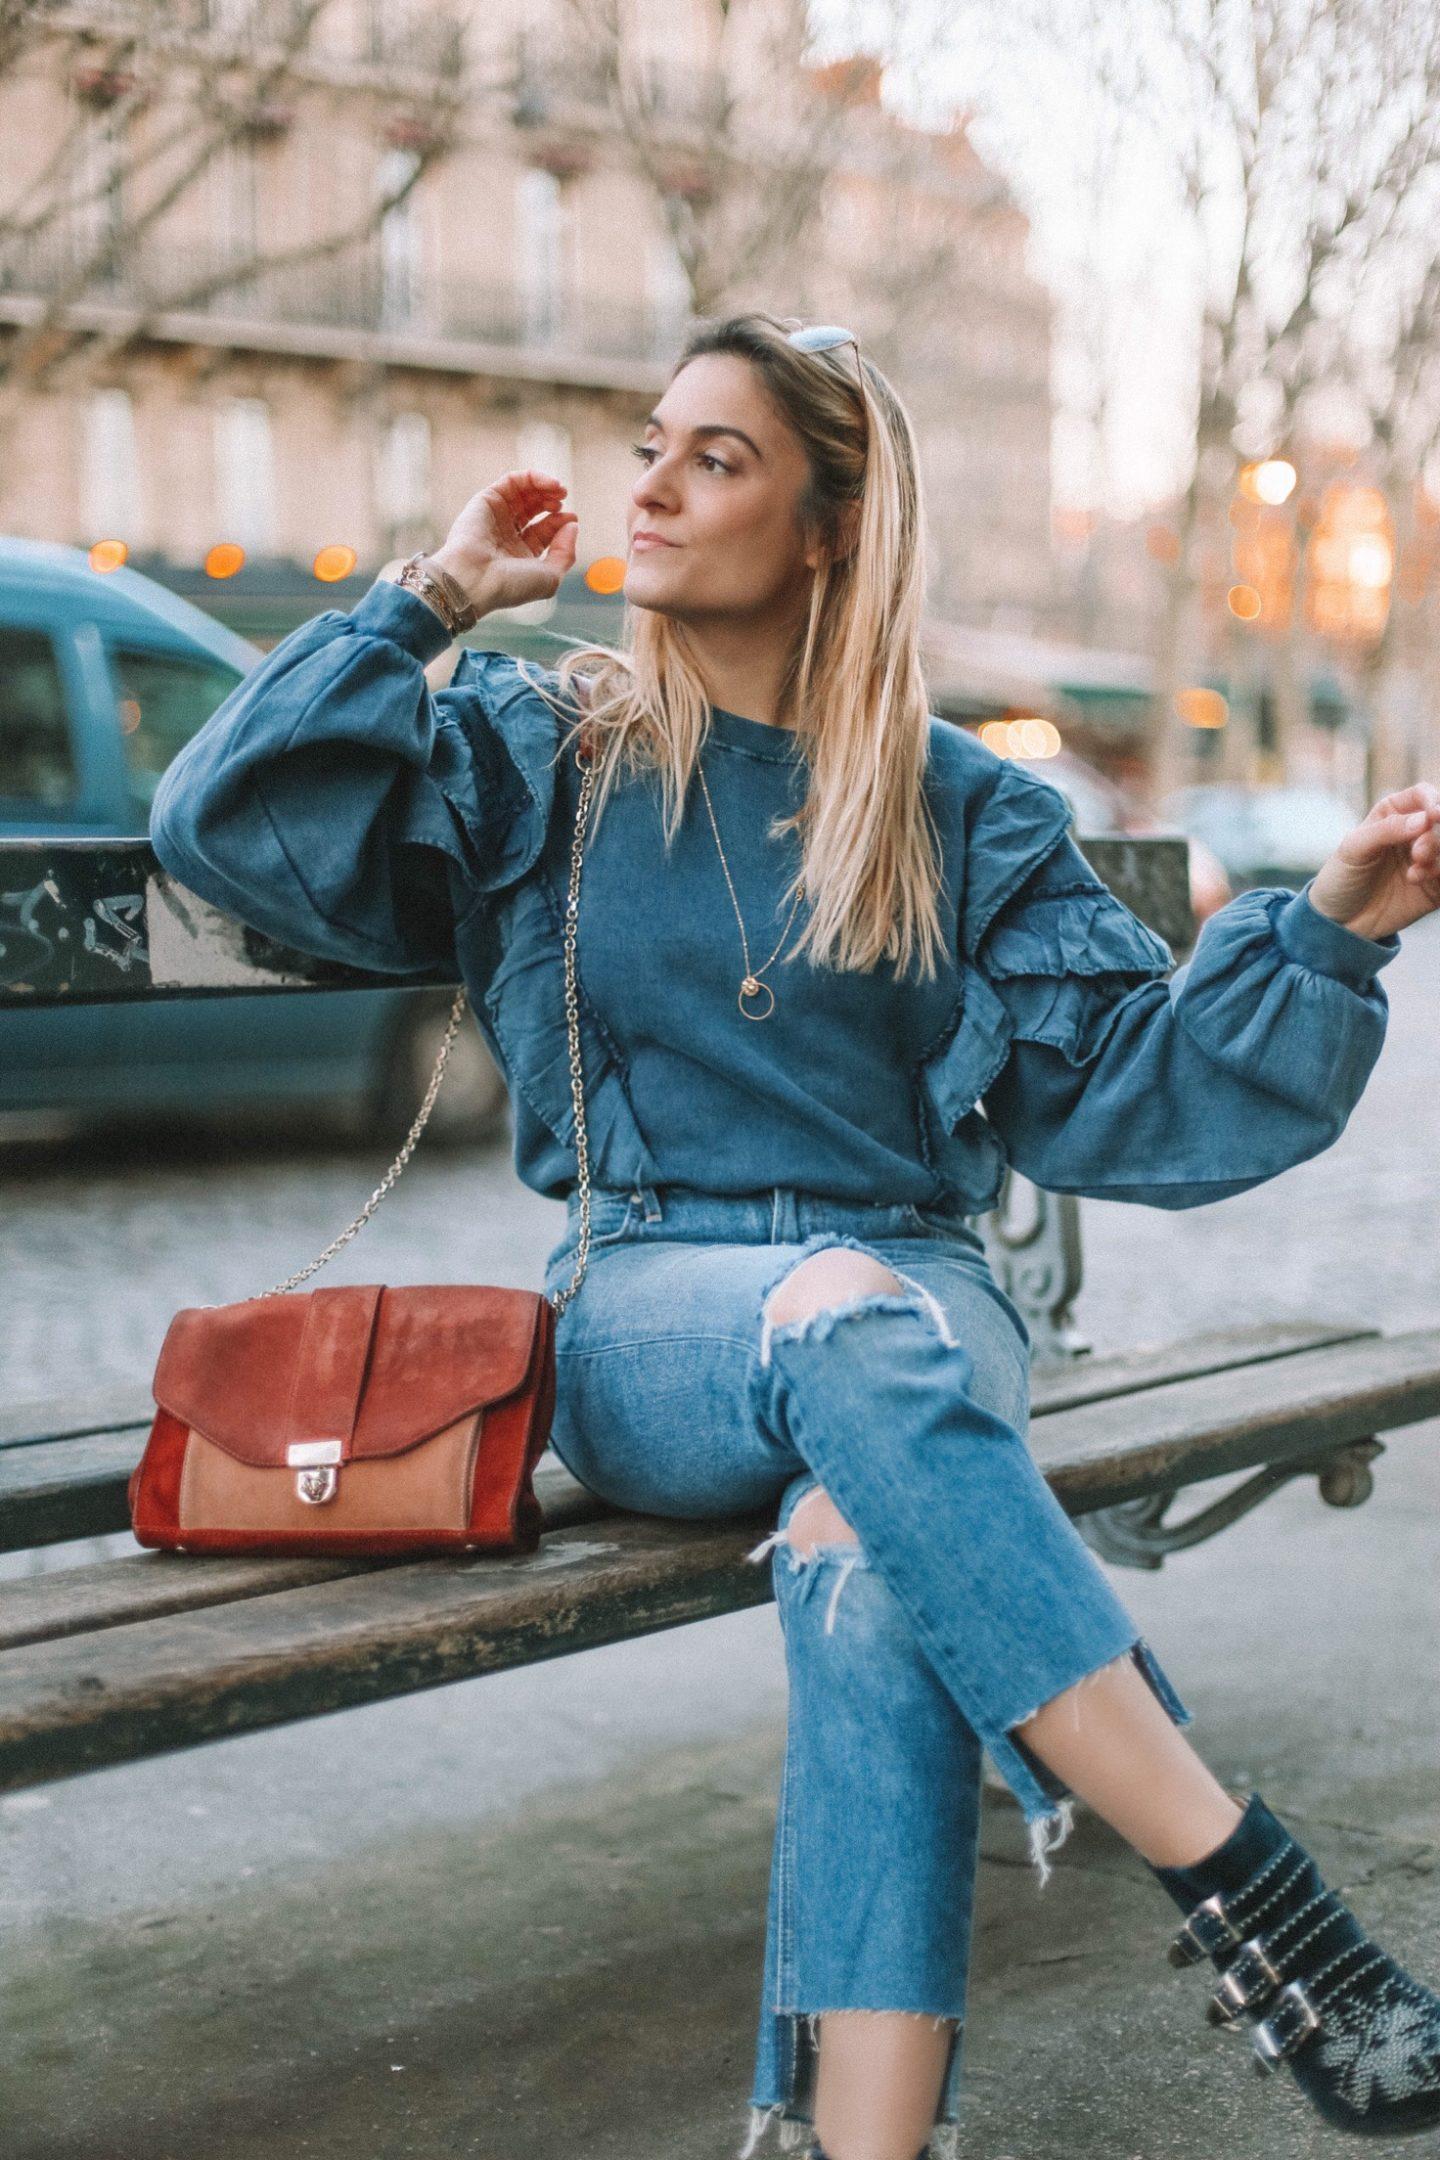 Jean Revolve - Blondie Baby blog mode & voyages